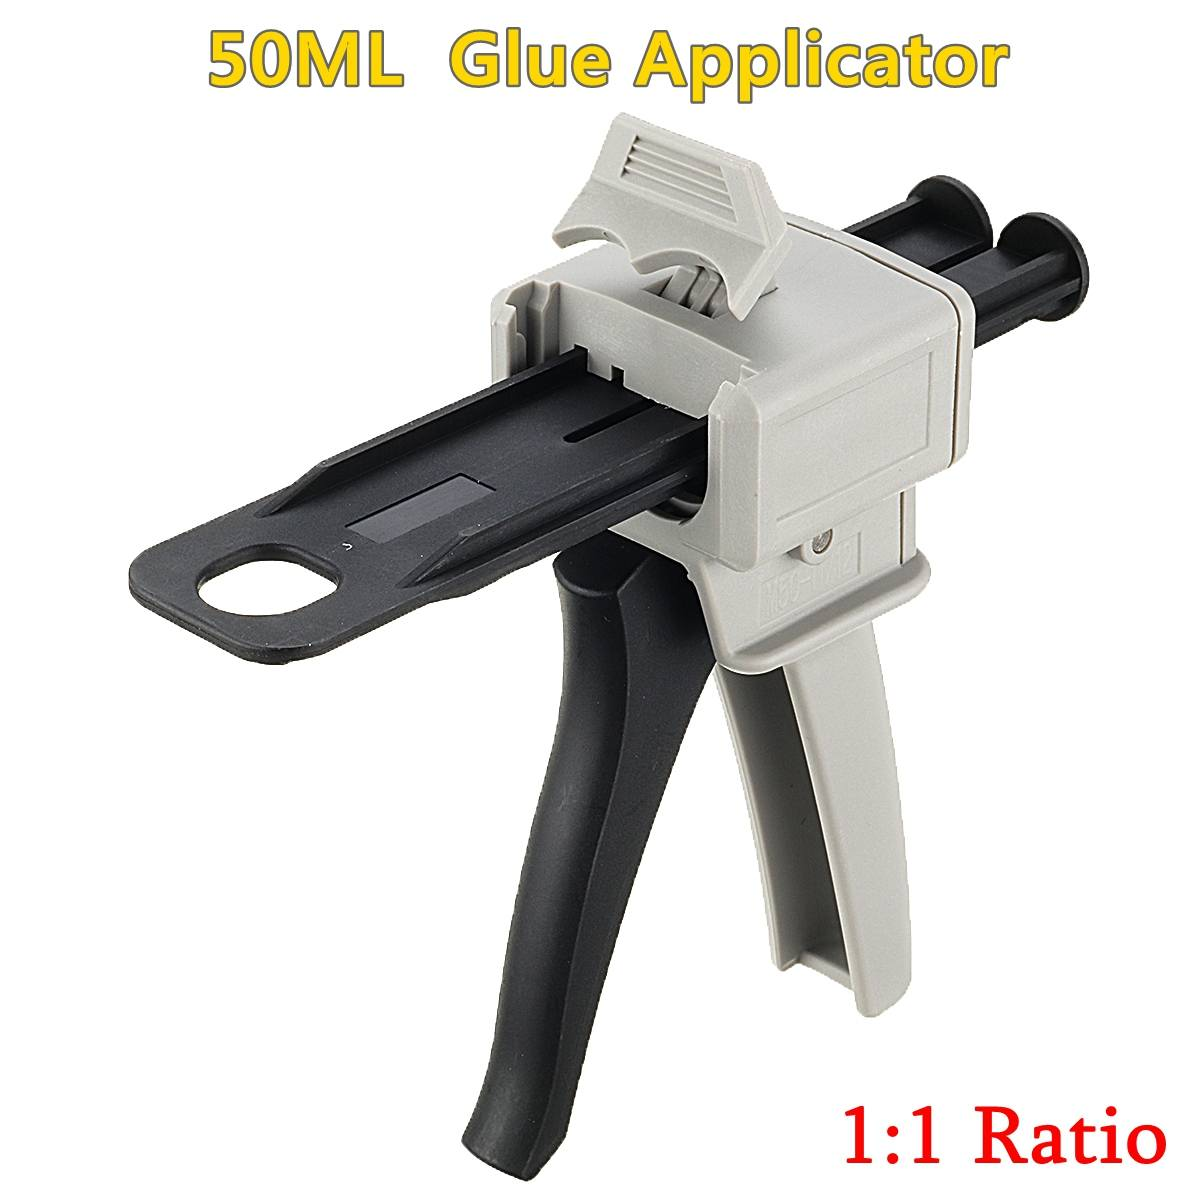 Glue G Un 50ml Two Component AB Epoxy Sealant Glue Applicator Glue Adhensive Squeeze Mixed 1:1 Manual G Un Dispenser